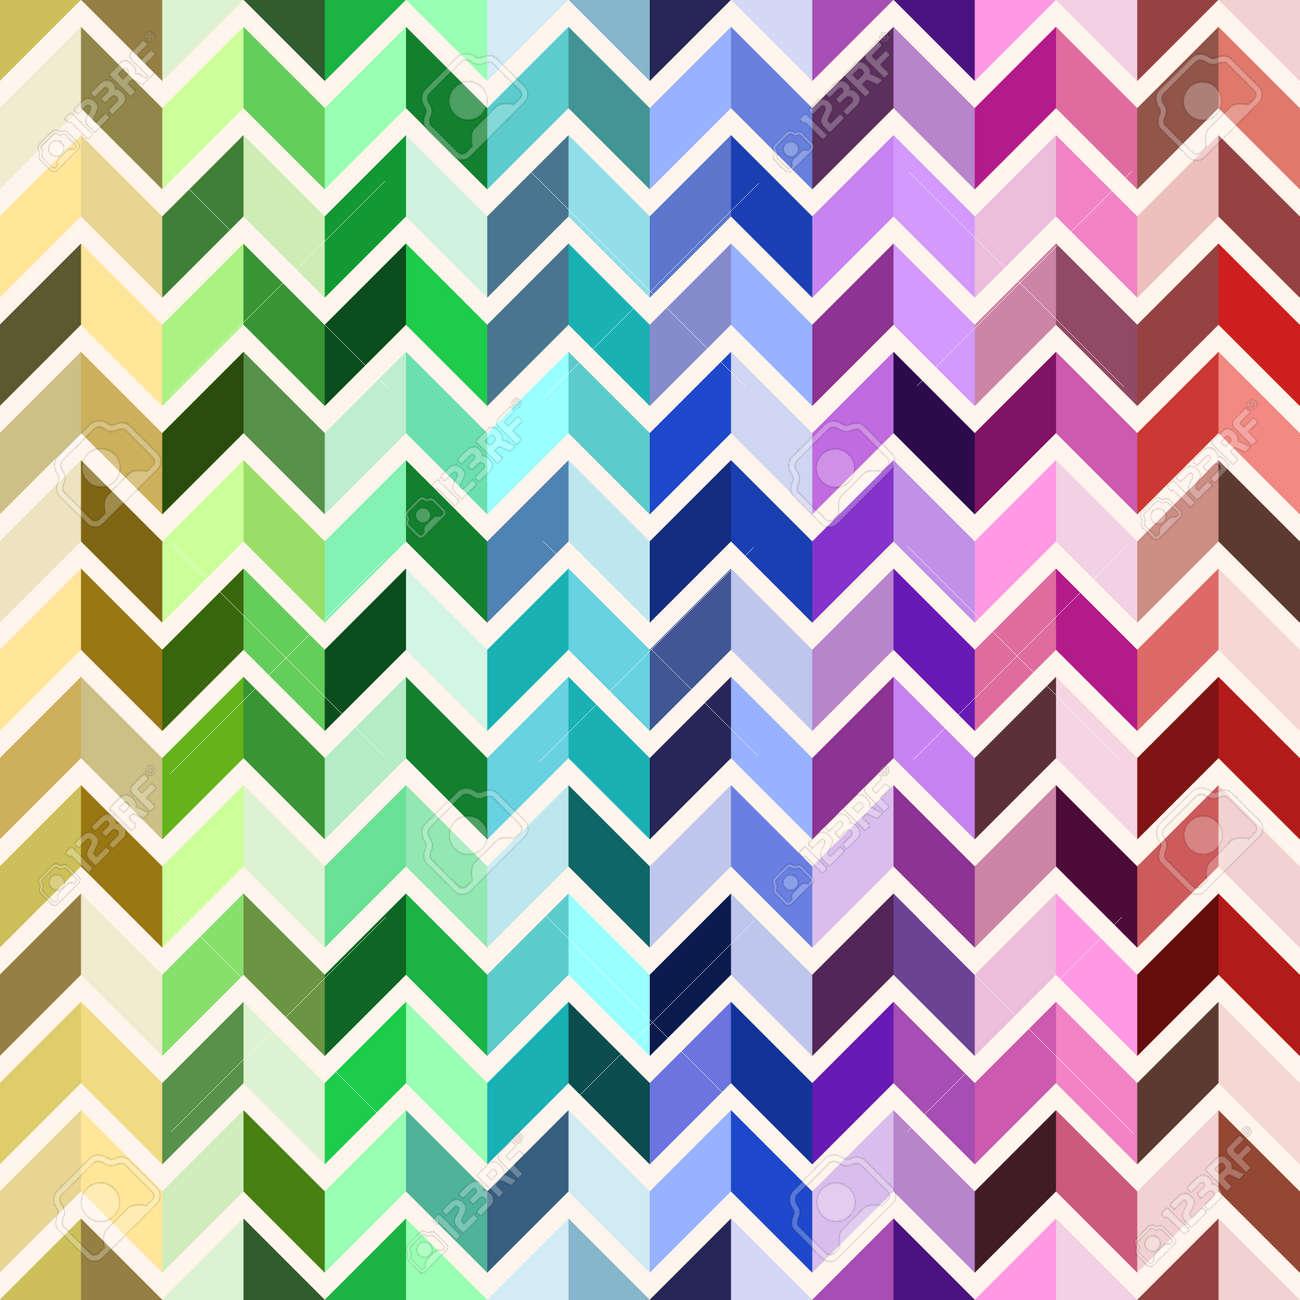 Modelo Geométrico Inconsútil, Mosaico Colorido, Color Del Arco Iris ...